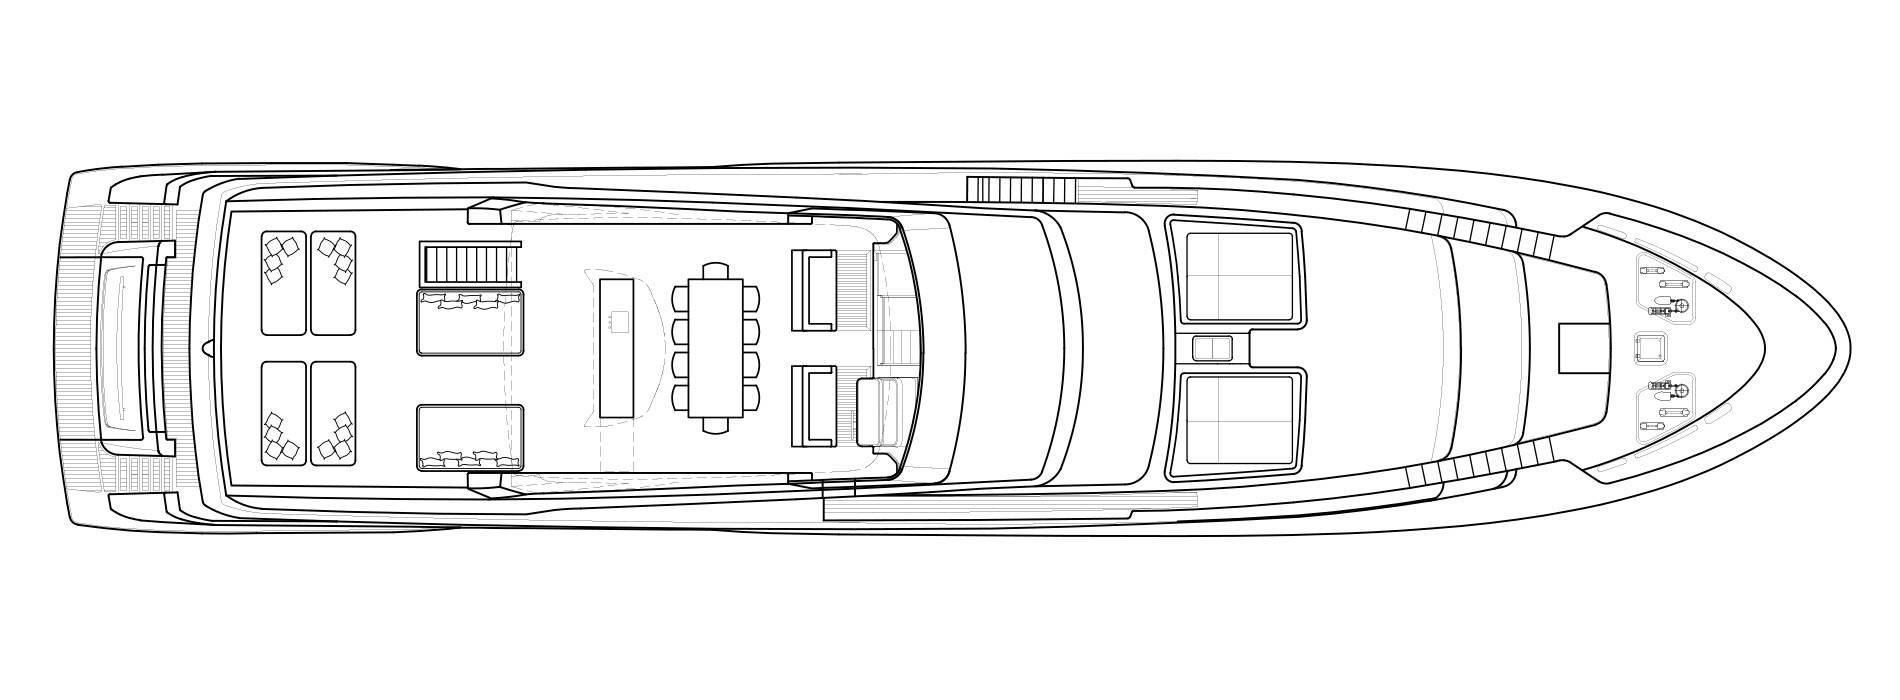 Sanlorenzo Yachts SL118 Флайбридж